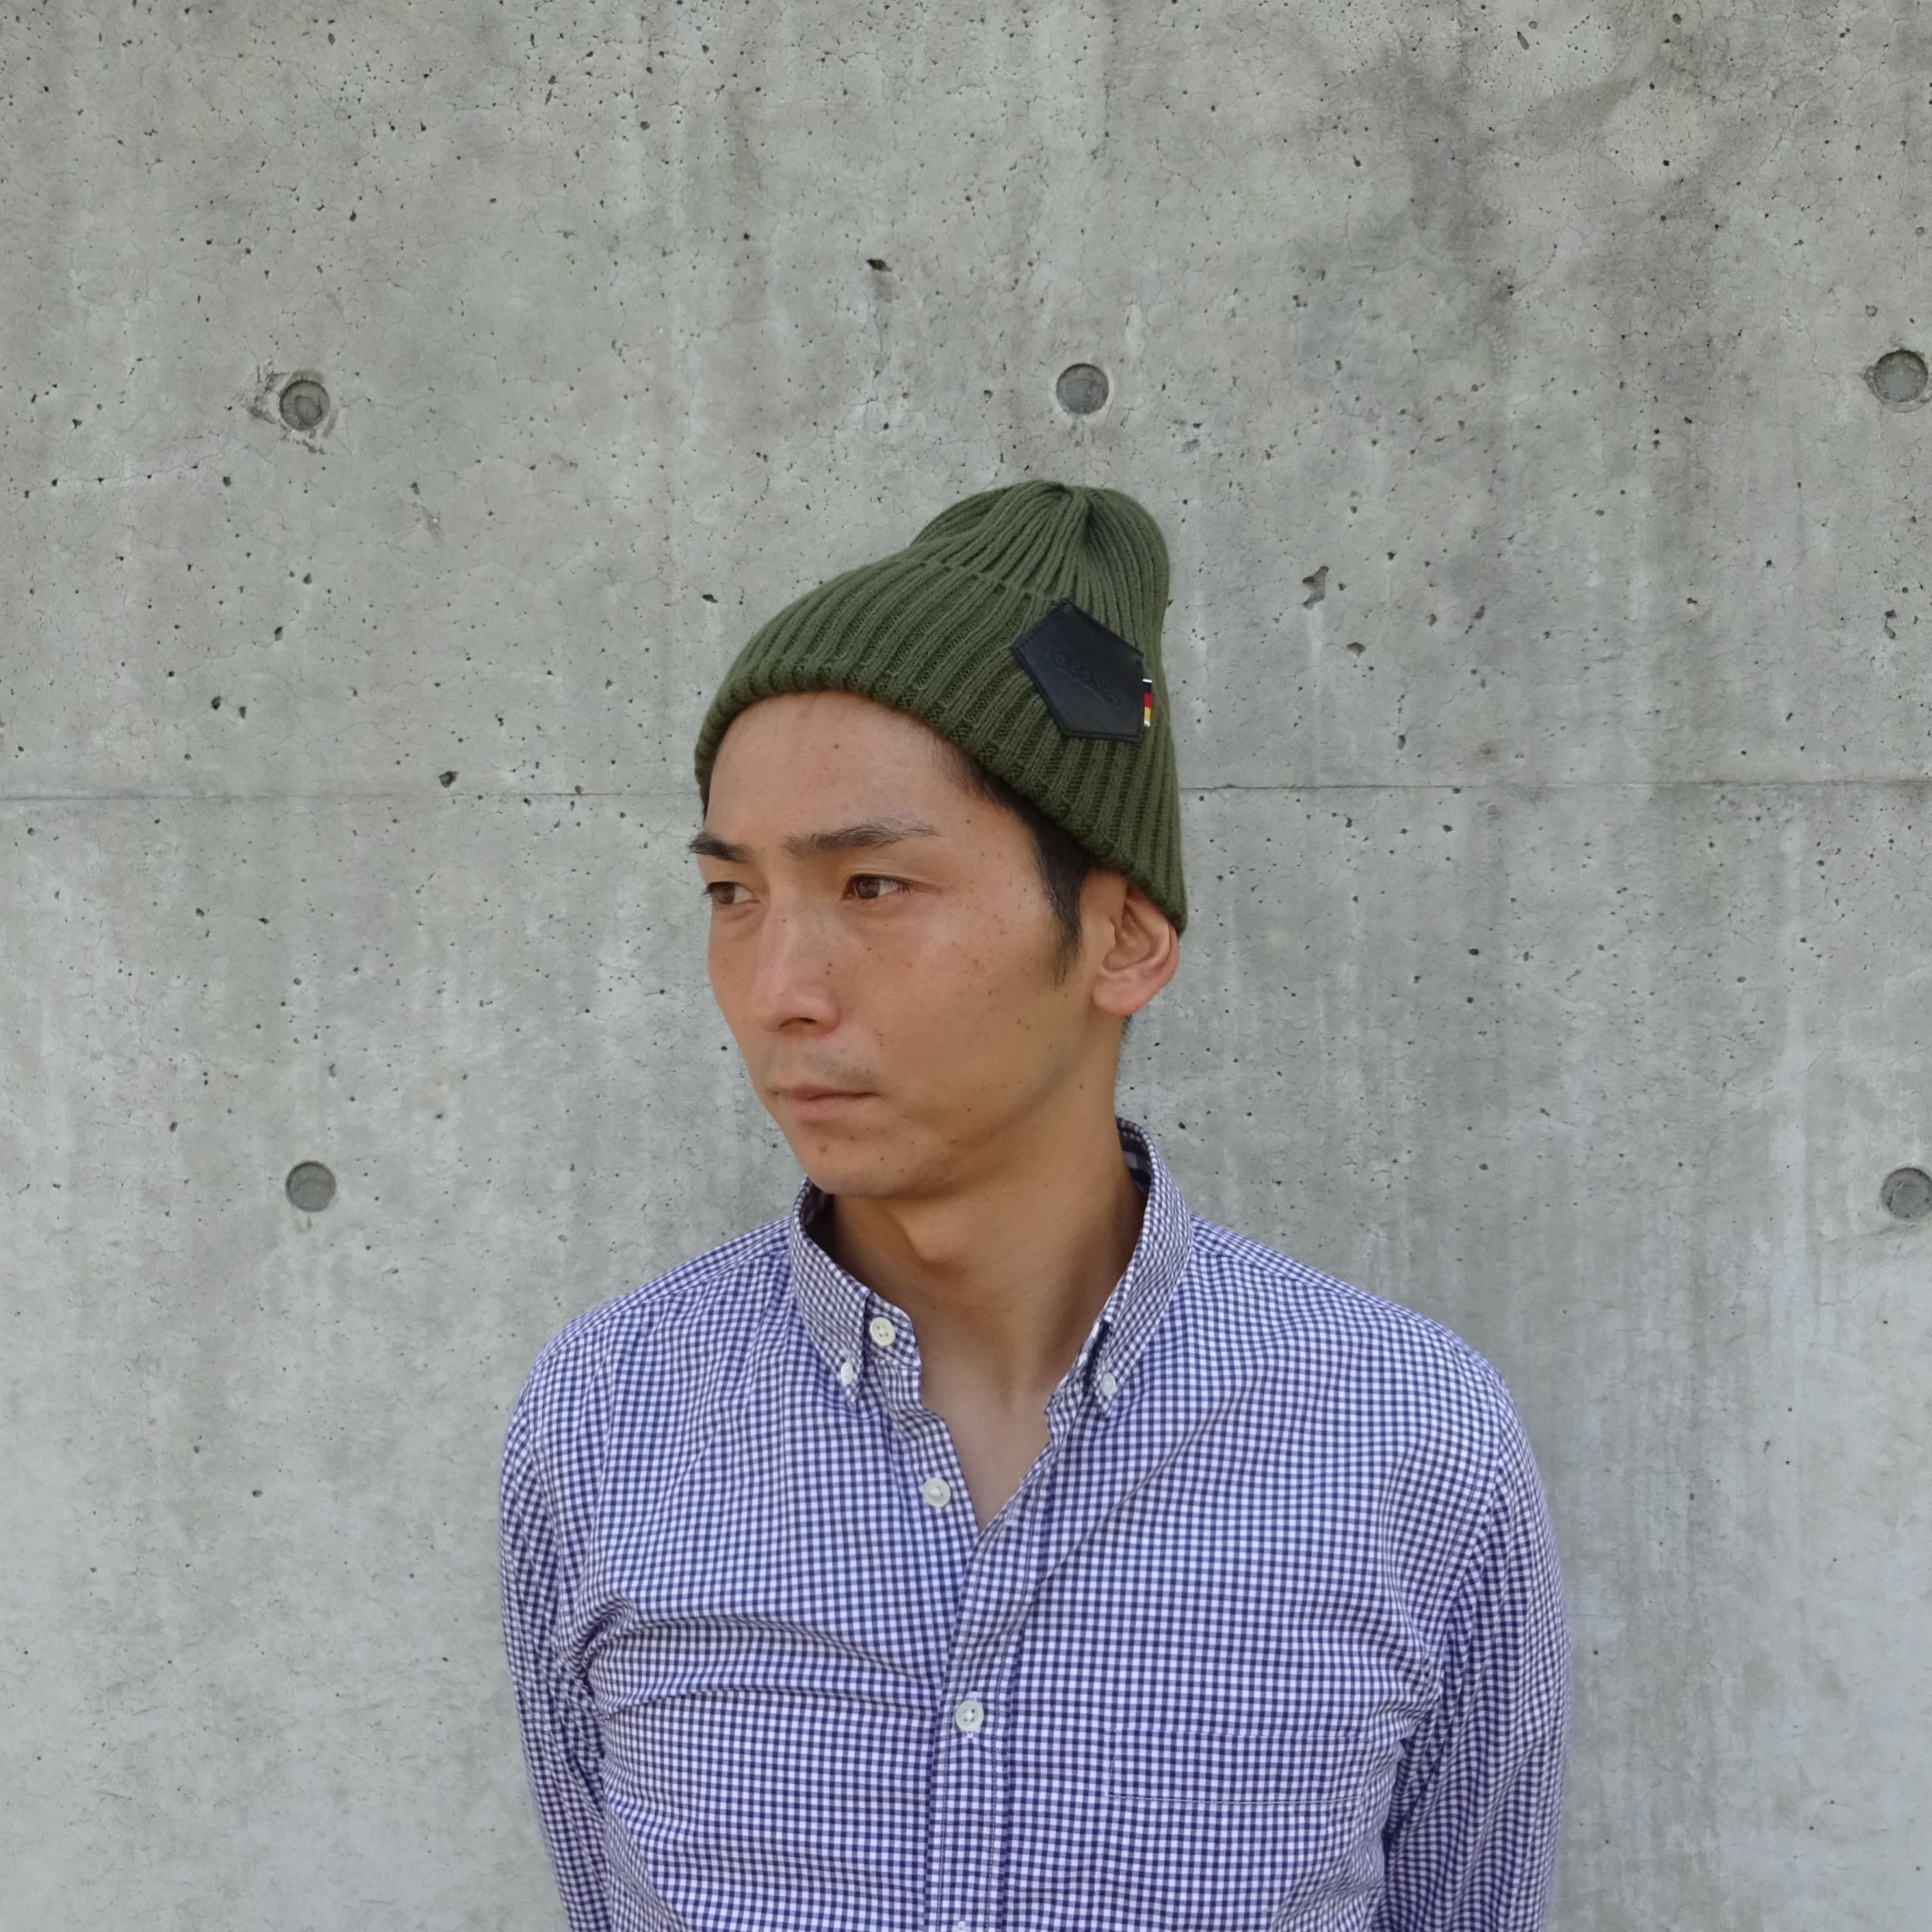 【UNISEX】Knit Cap (KHAKI) / item cord: B1712-KHAKI